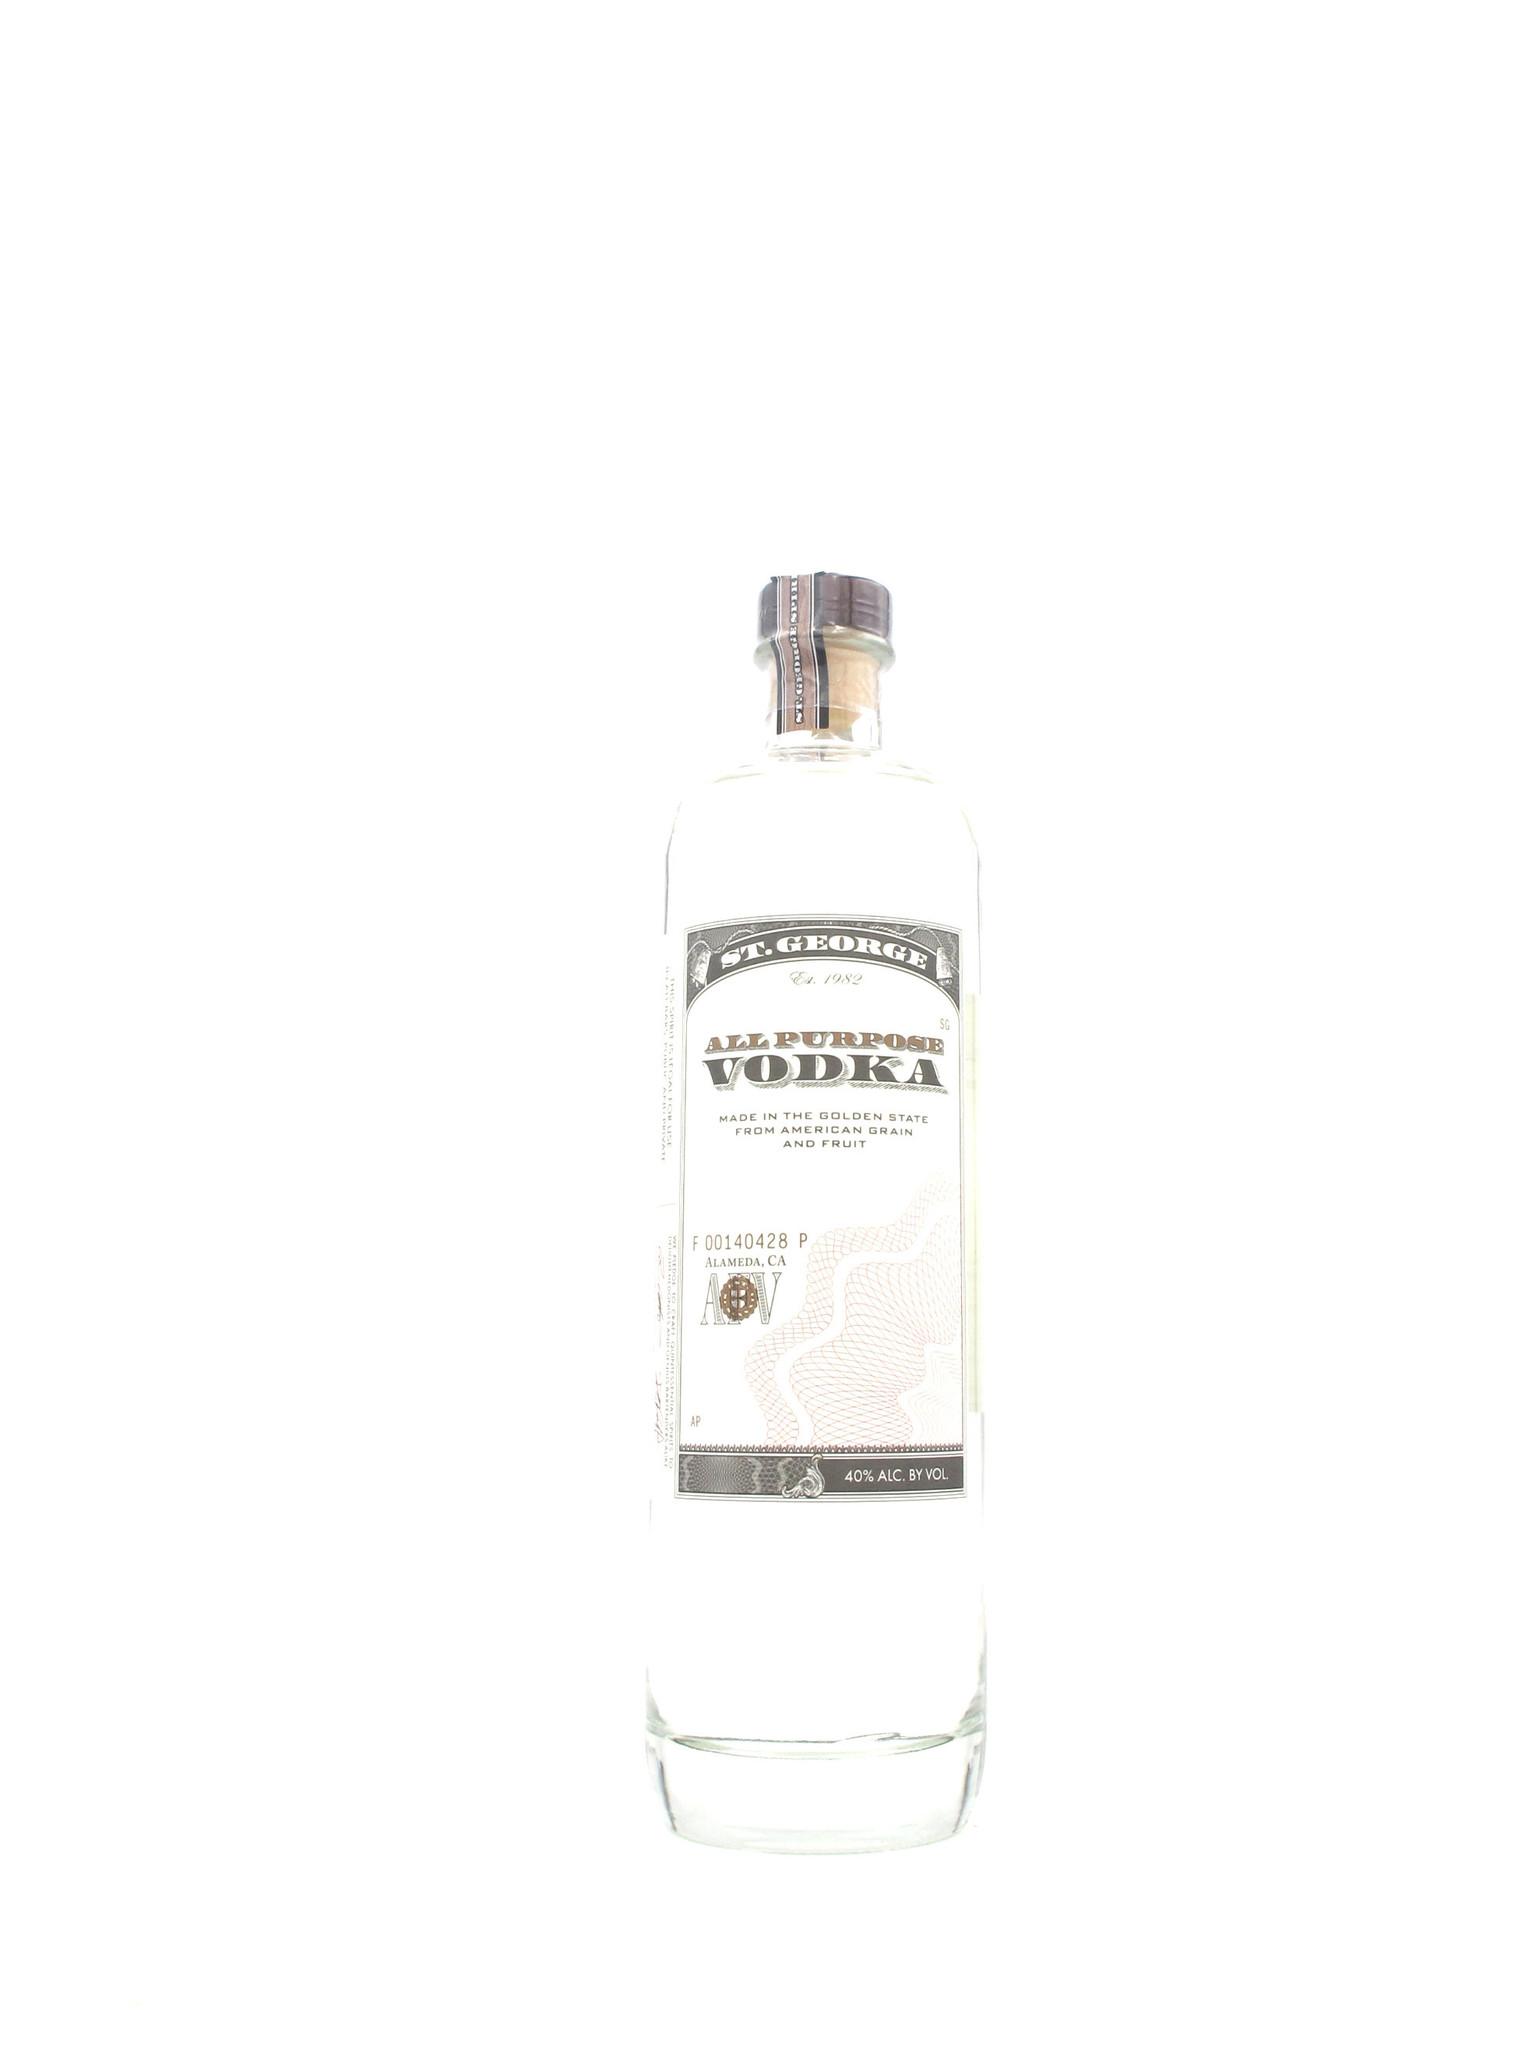 St. George Spirits St. George All Purpose Vodka 750mL